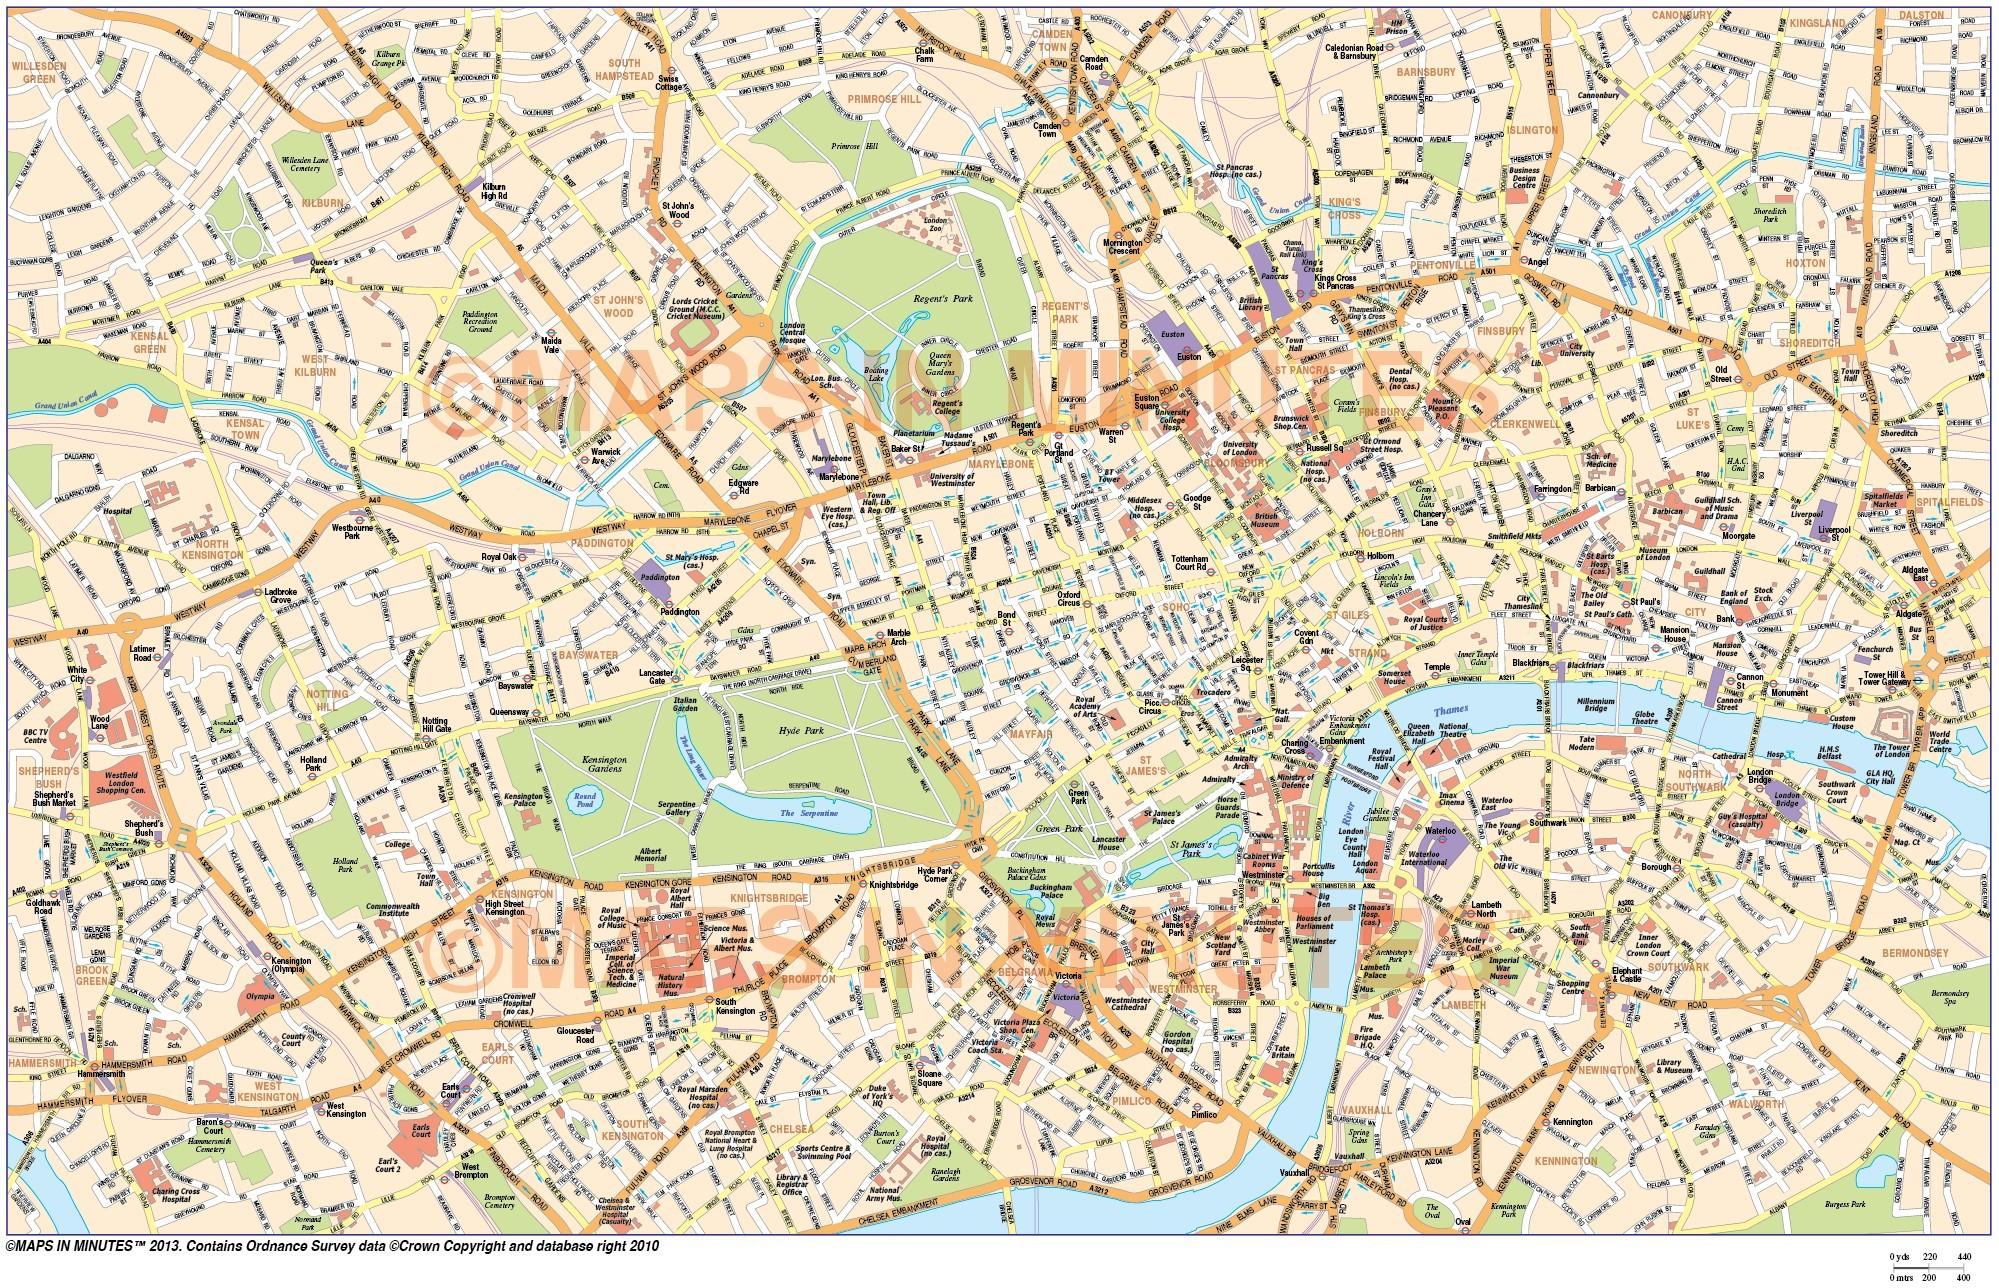 London Atlas Map.Digital Vector Map Of London In Illustrator Editable Format Royalty